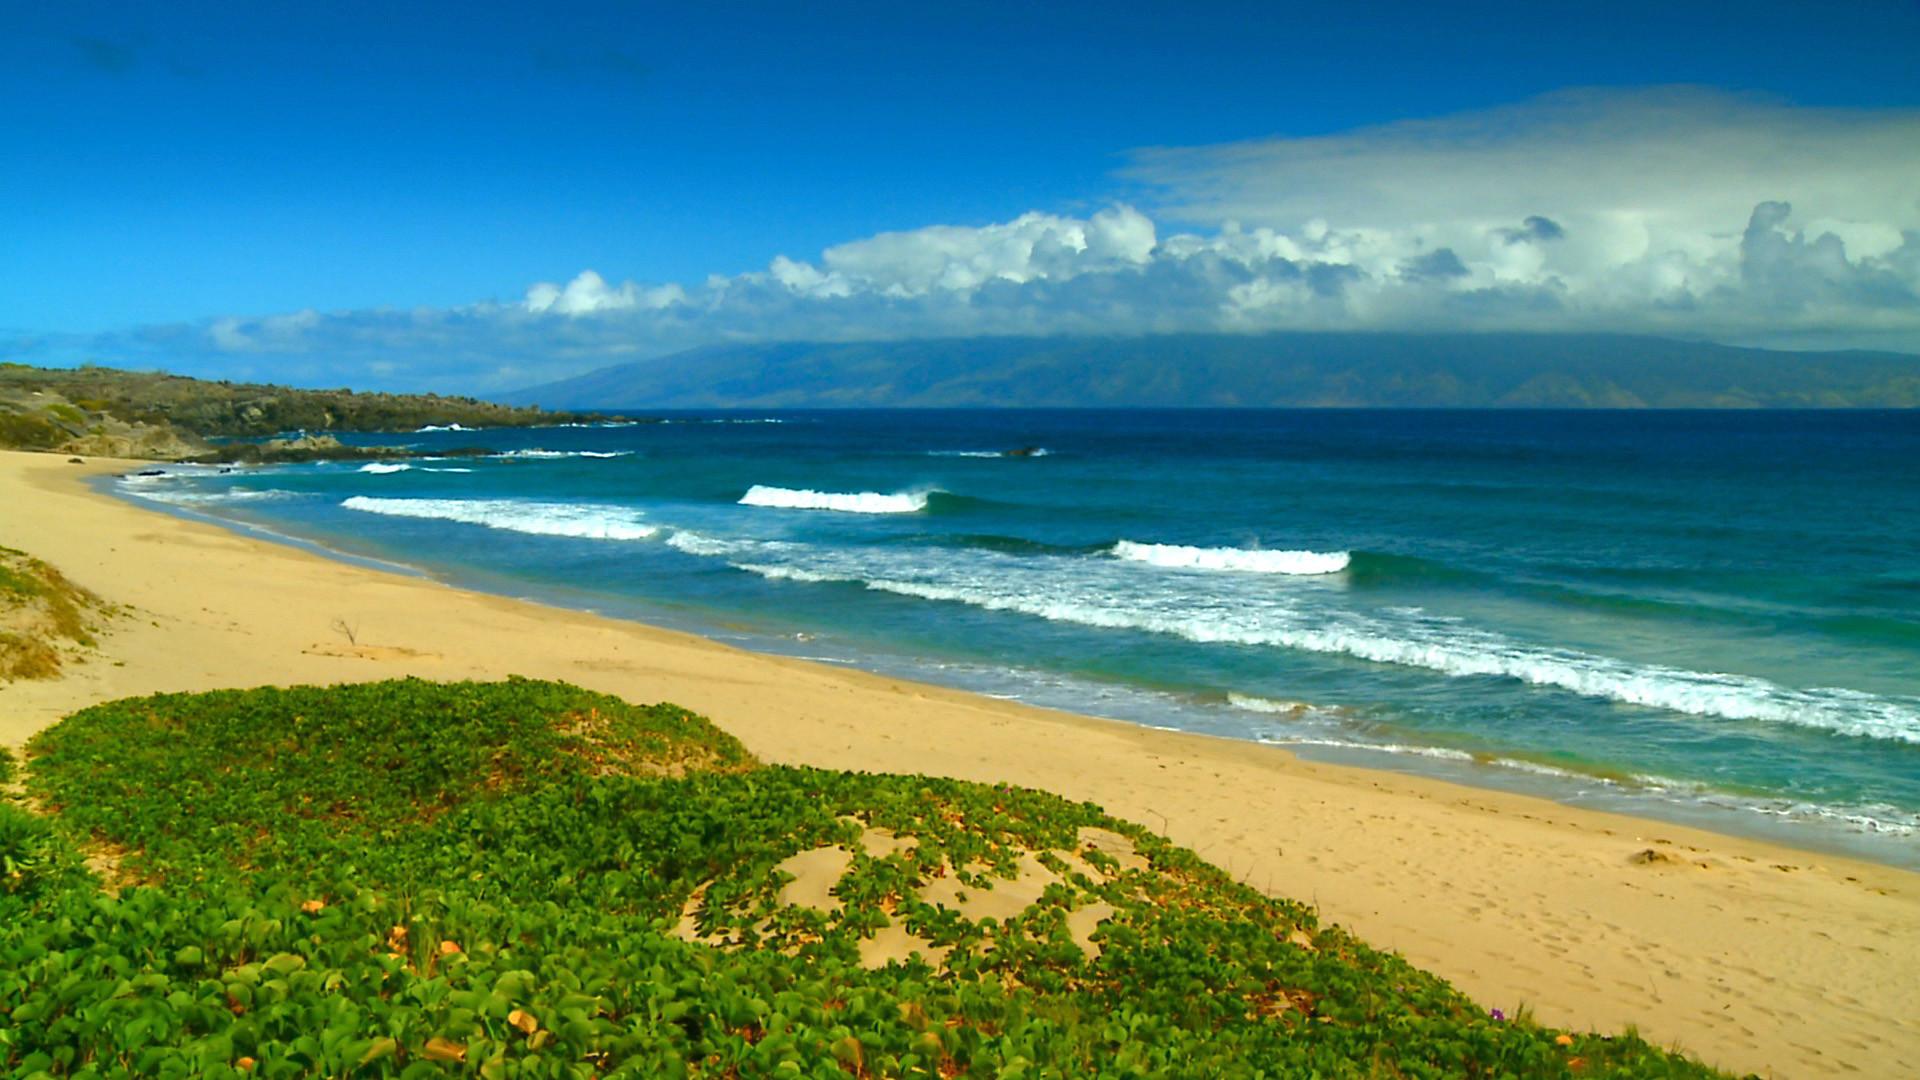 Live Stunning Hawaii Wallpapers | Stunning Hawaii Wallpapers Collection